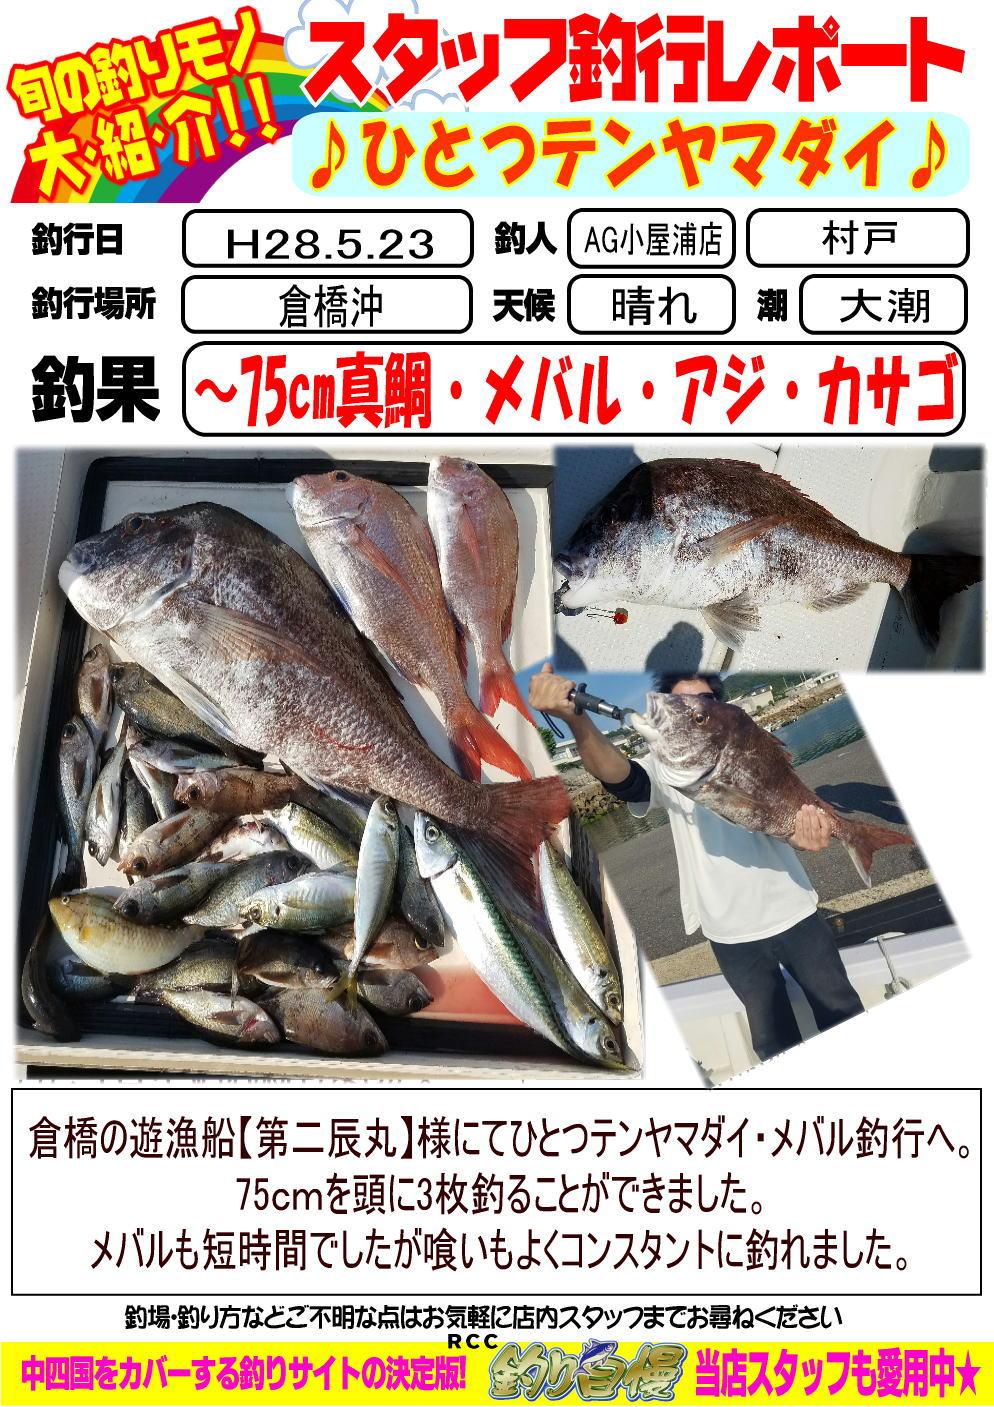 http://www.e-angle.co.jp/shop/blog/blog-2016-05-23-koyaura-hitotutennya.jpg